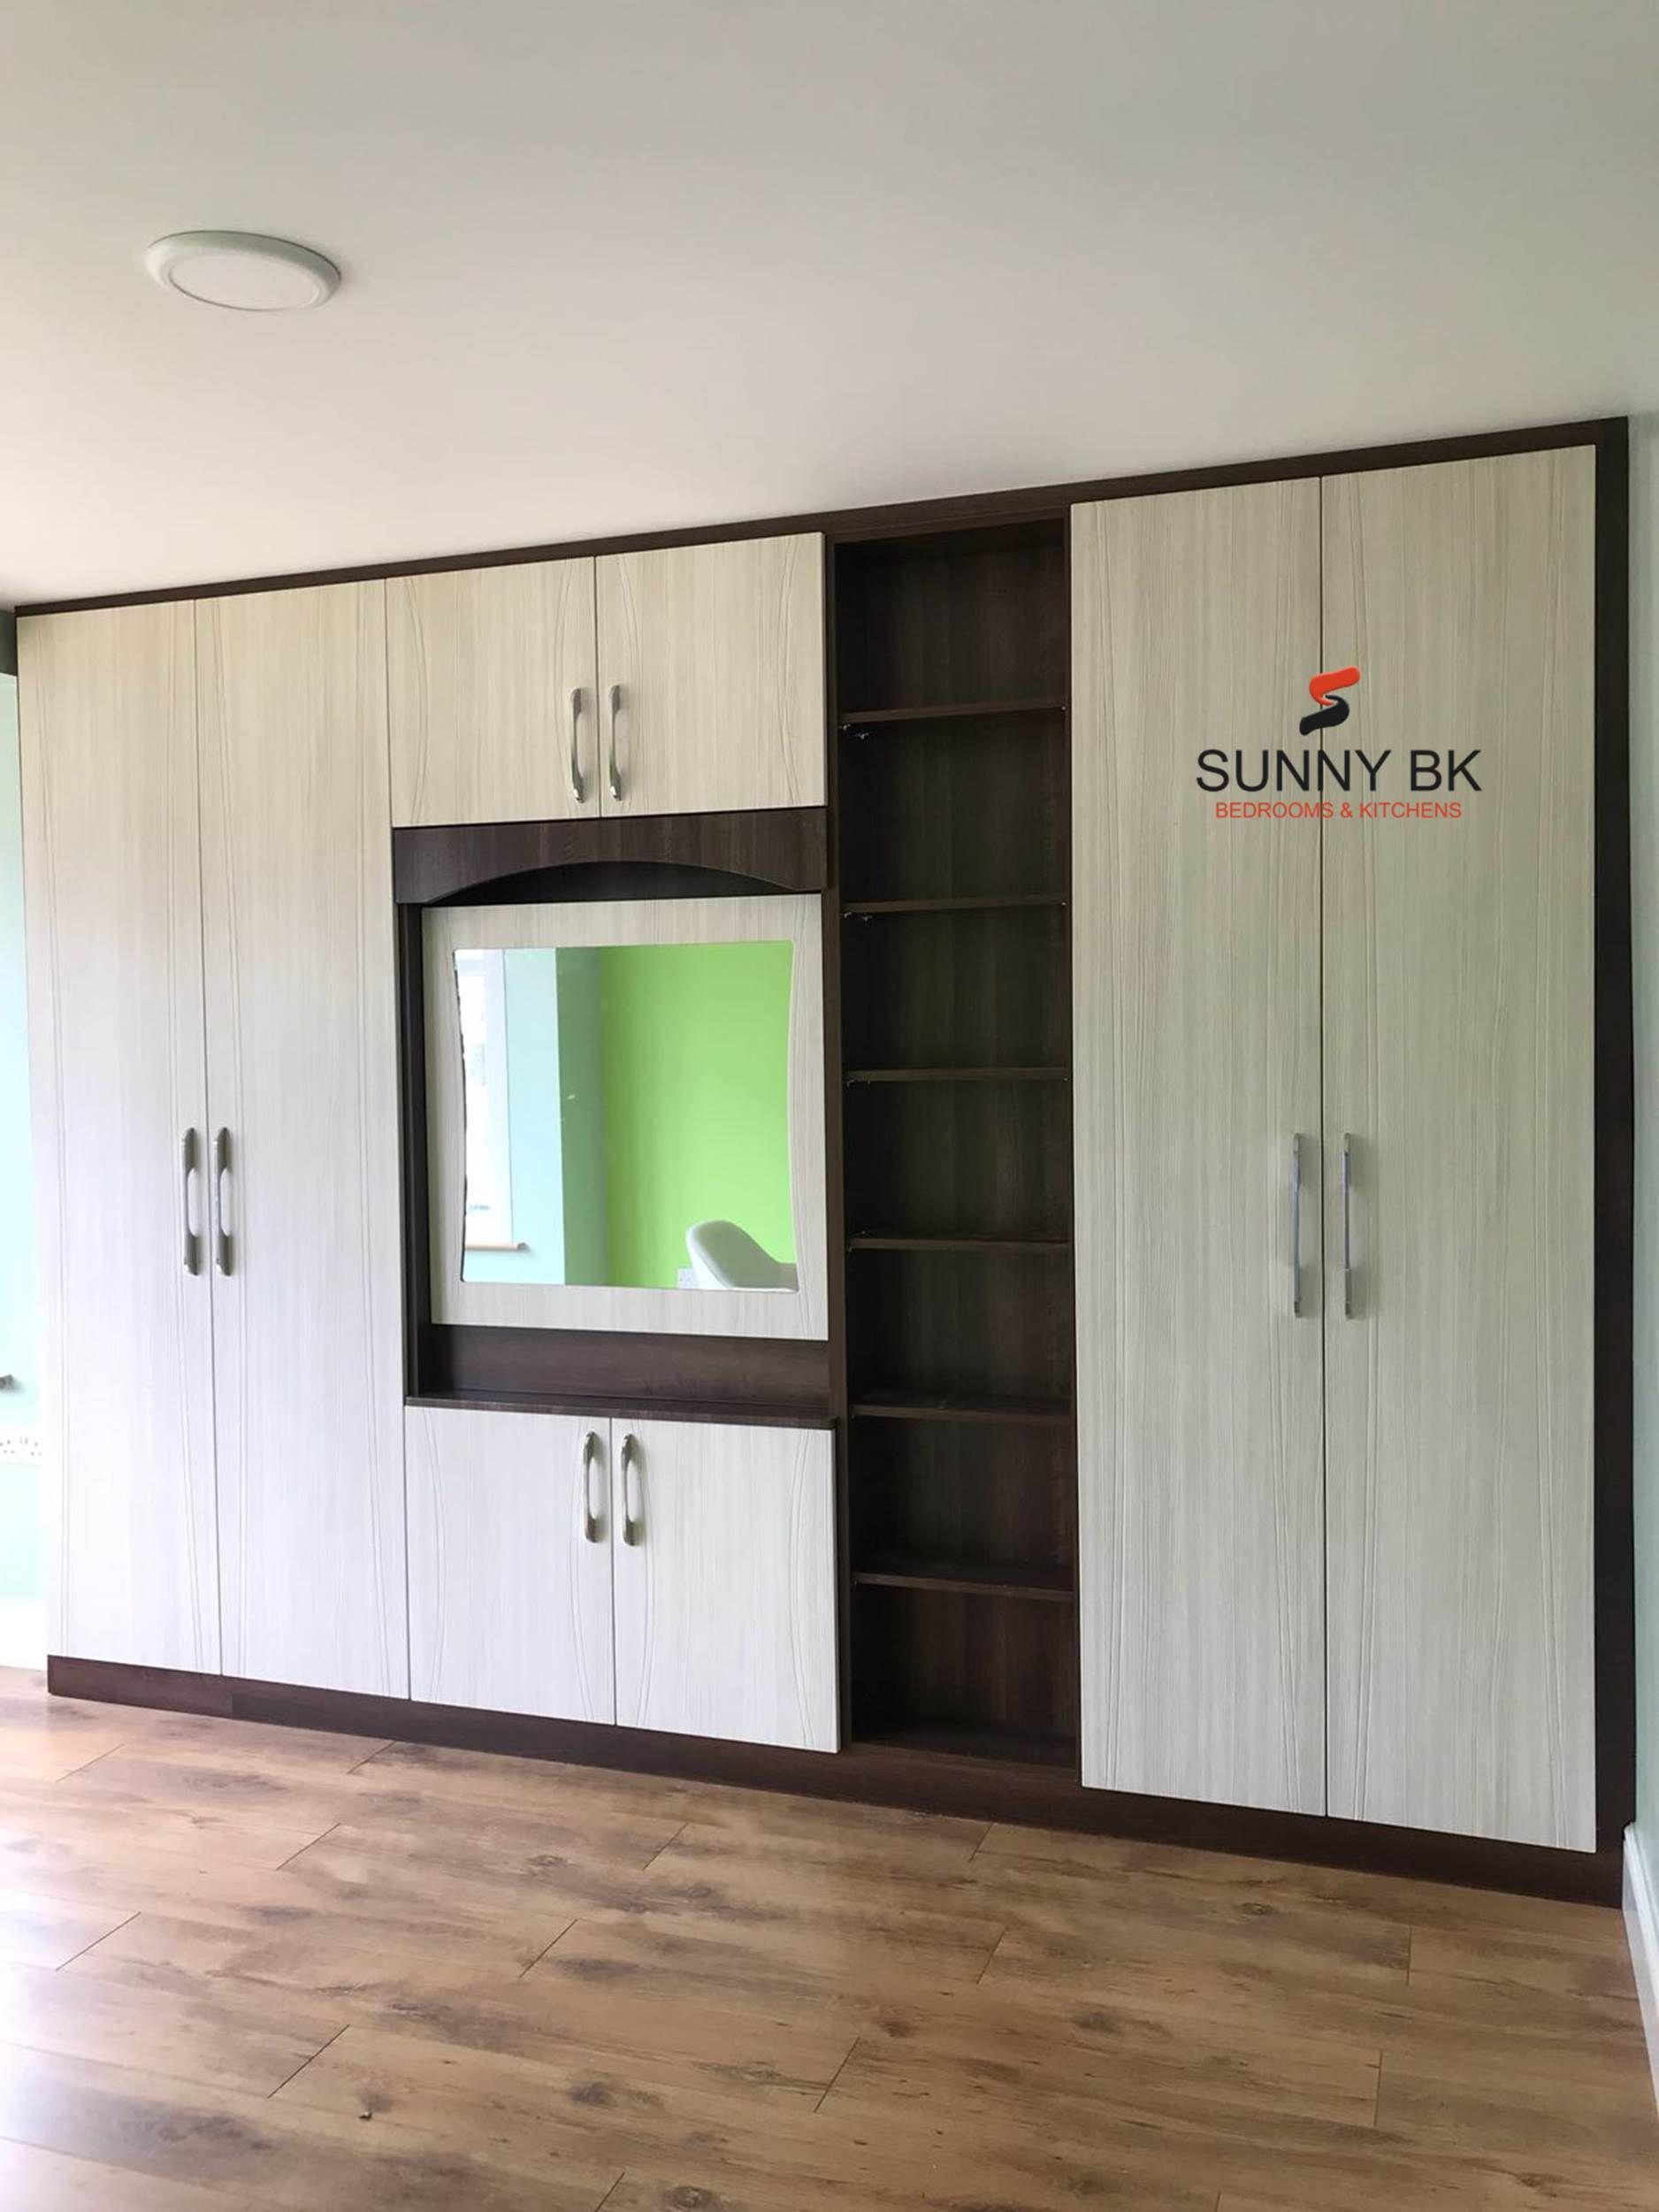 Sunny Bk Bedroom Cupboard Designs Fitted Bedrooms Wardrobe